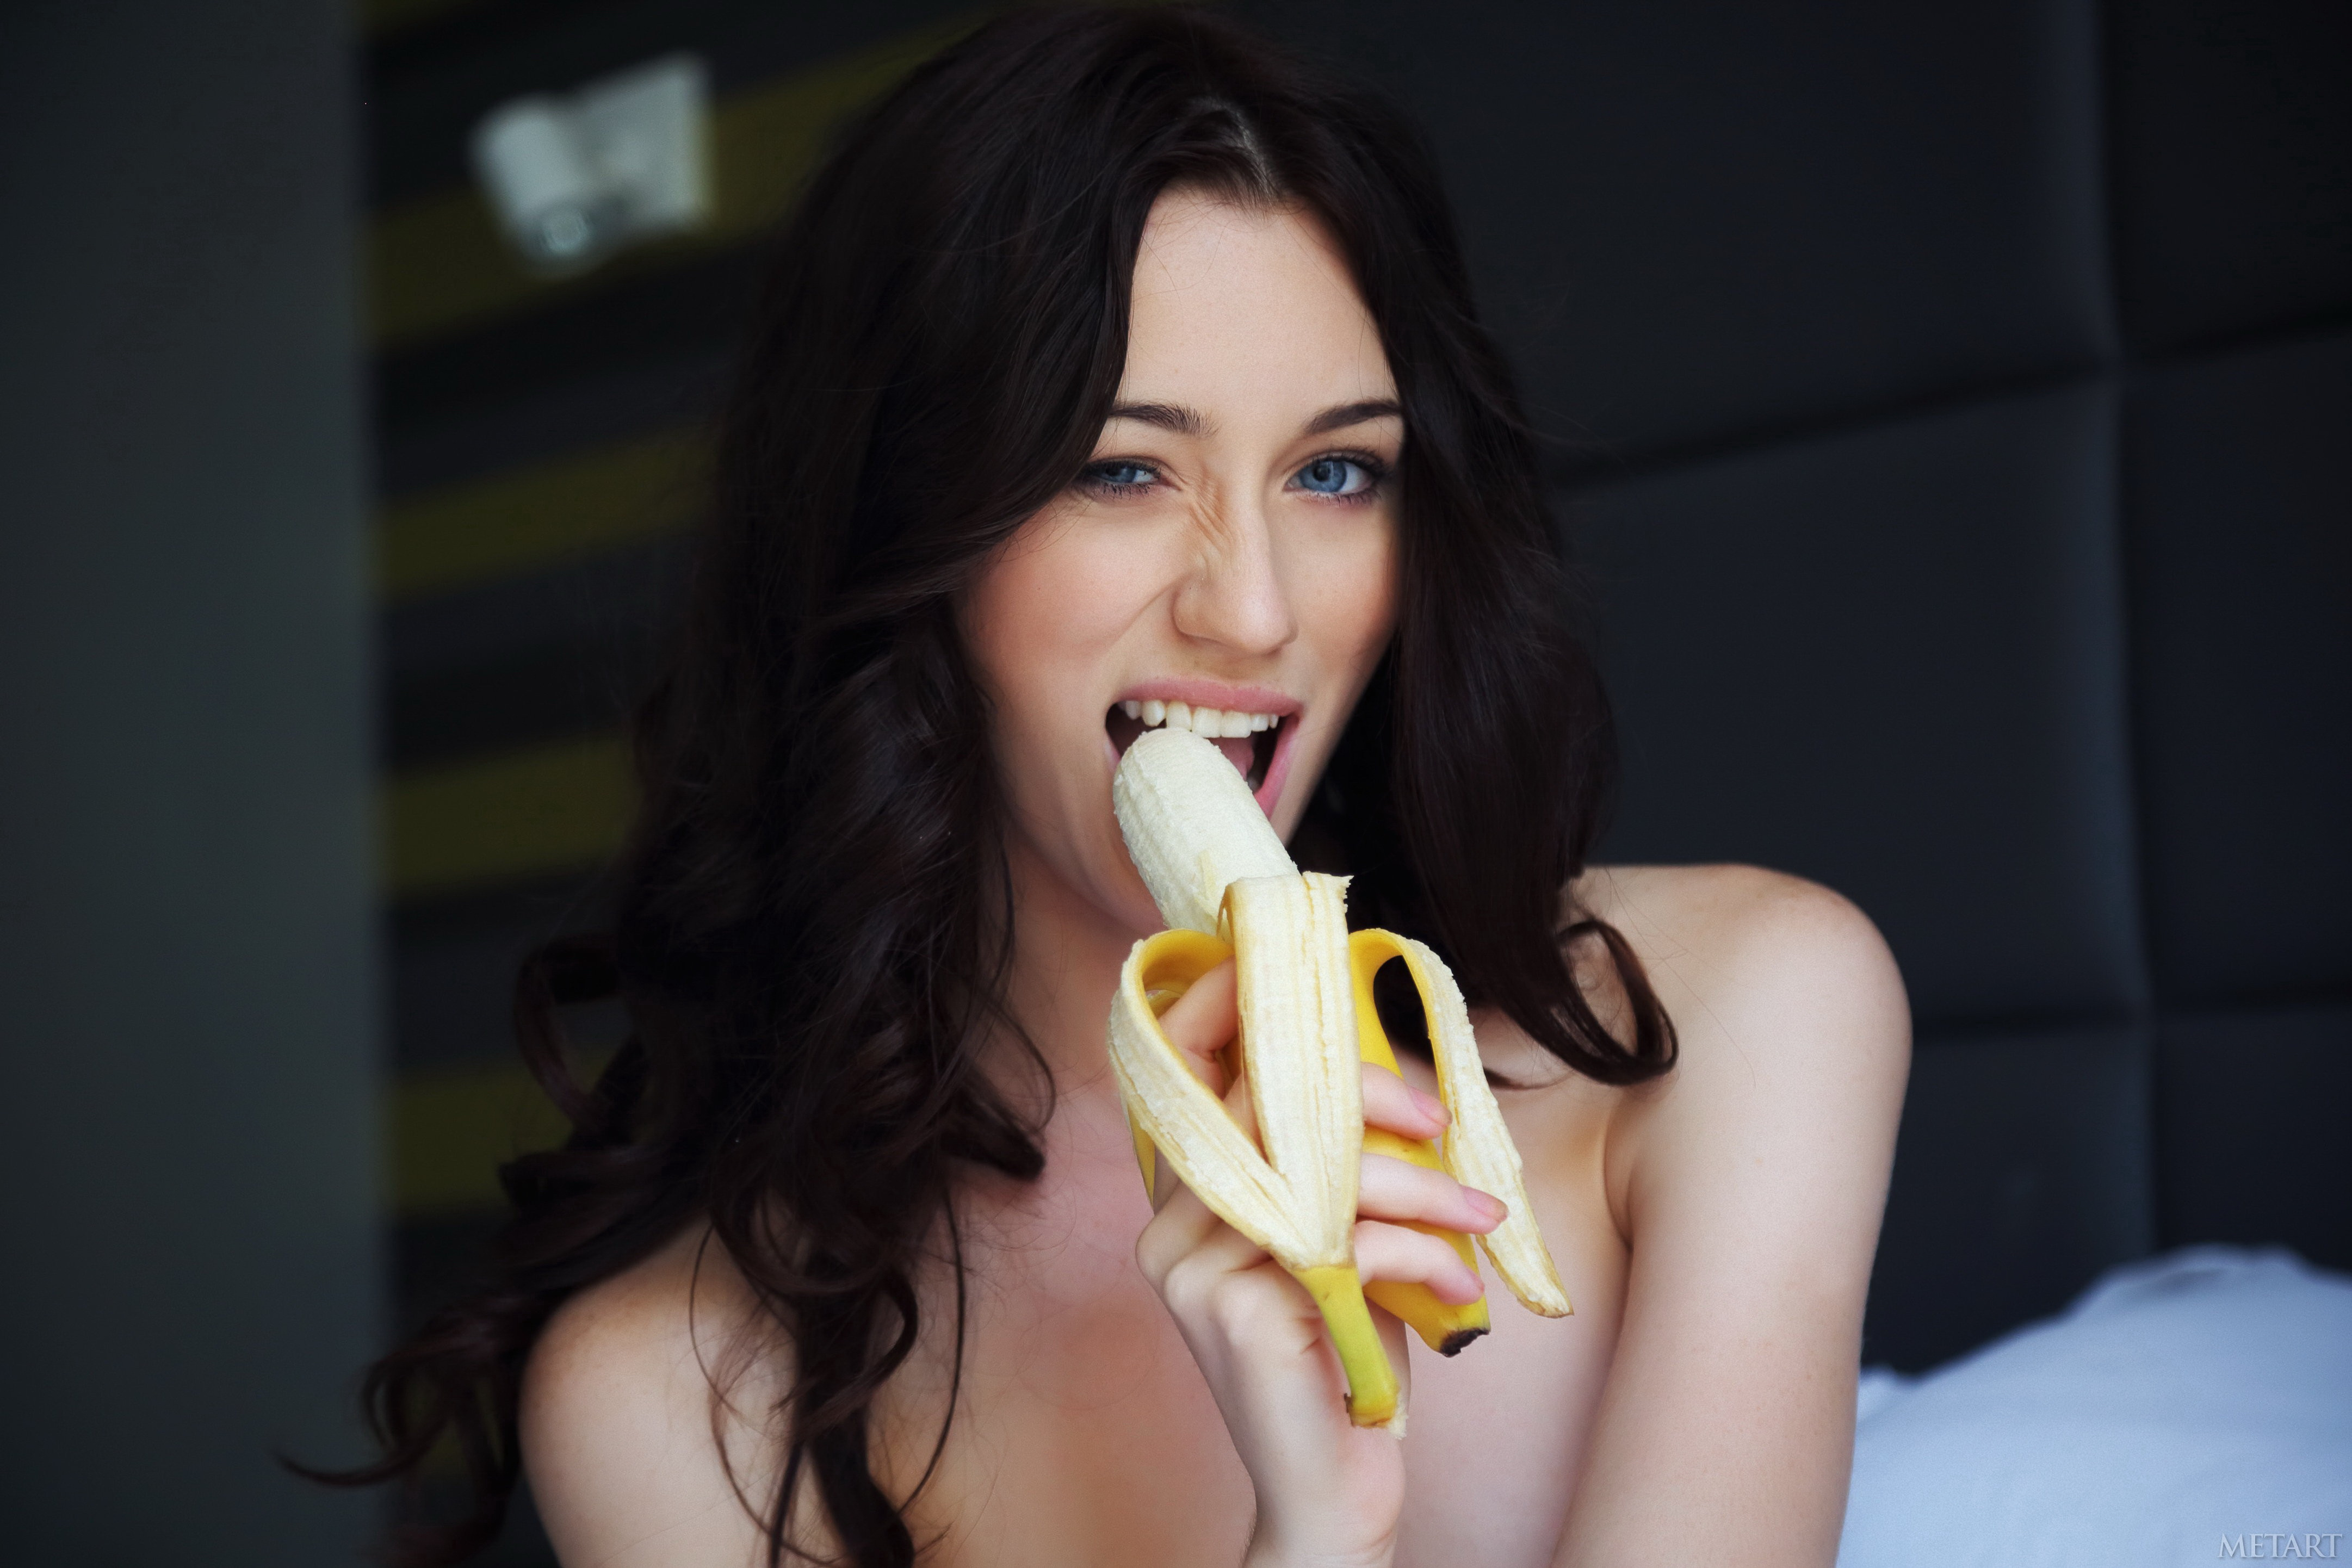 Картинки с бананом во рту, картинки